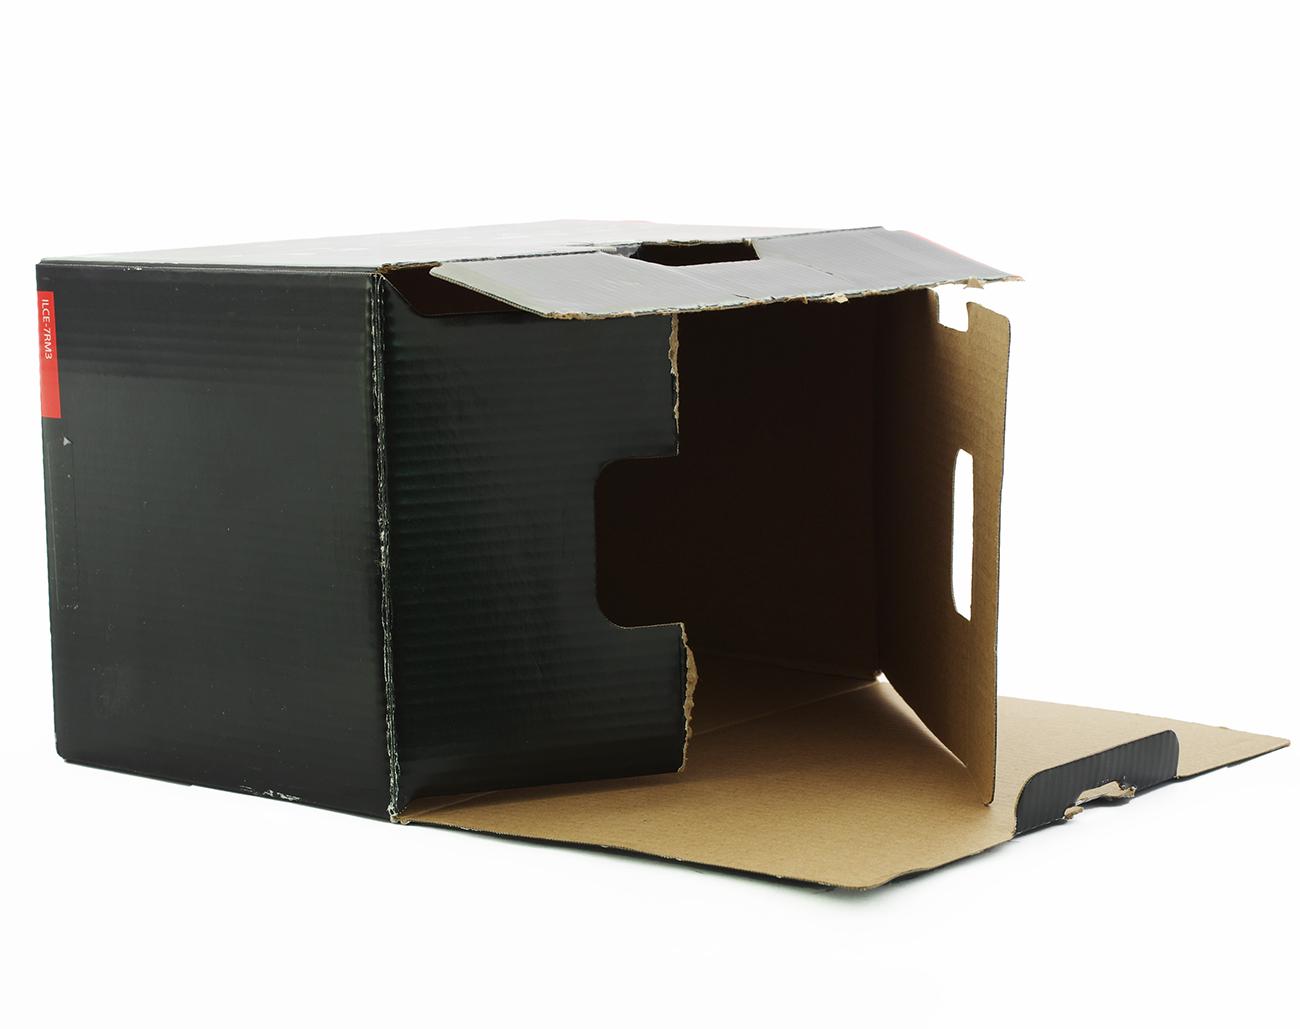 Sony-Alpha-7R-III-ILCE-7RM3-only-EMPTY-BOX Indexbild 4